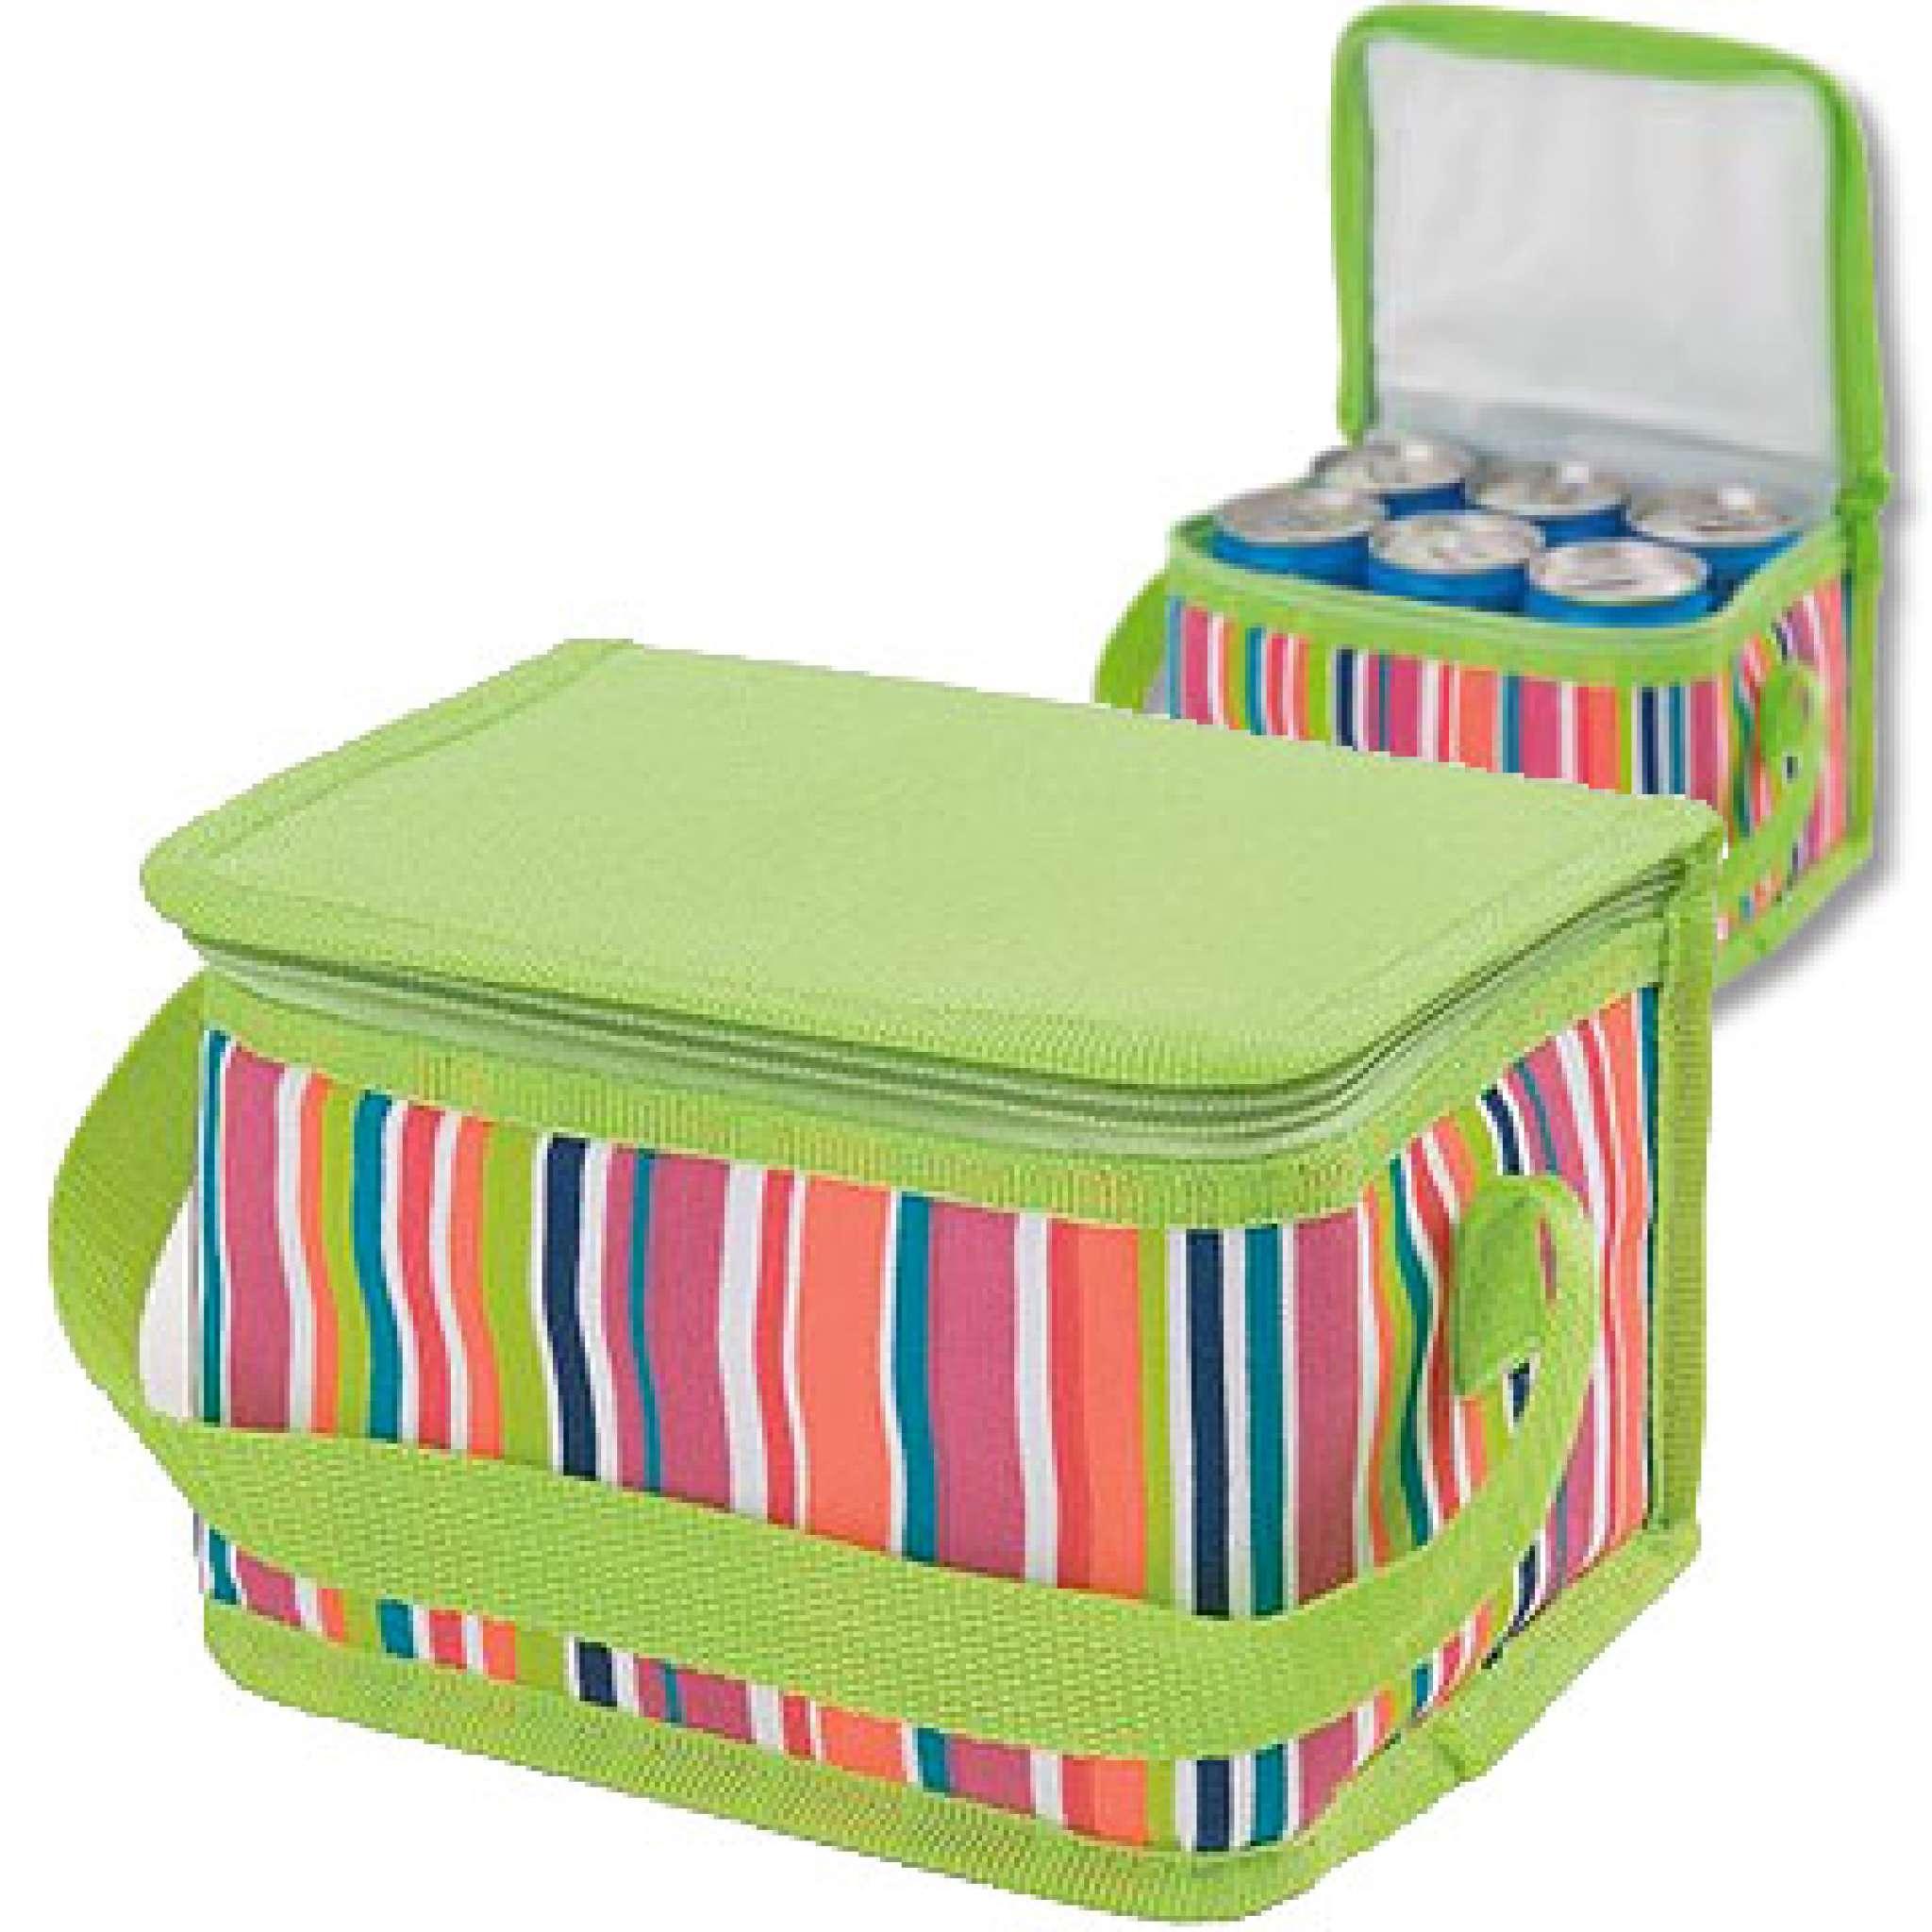 Sommer Sechser Pack Kühltasche